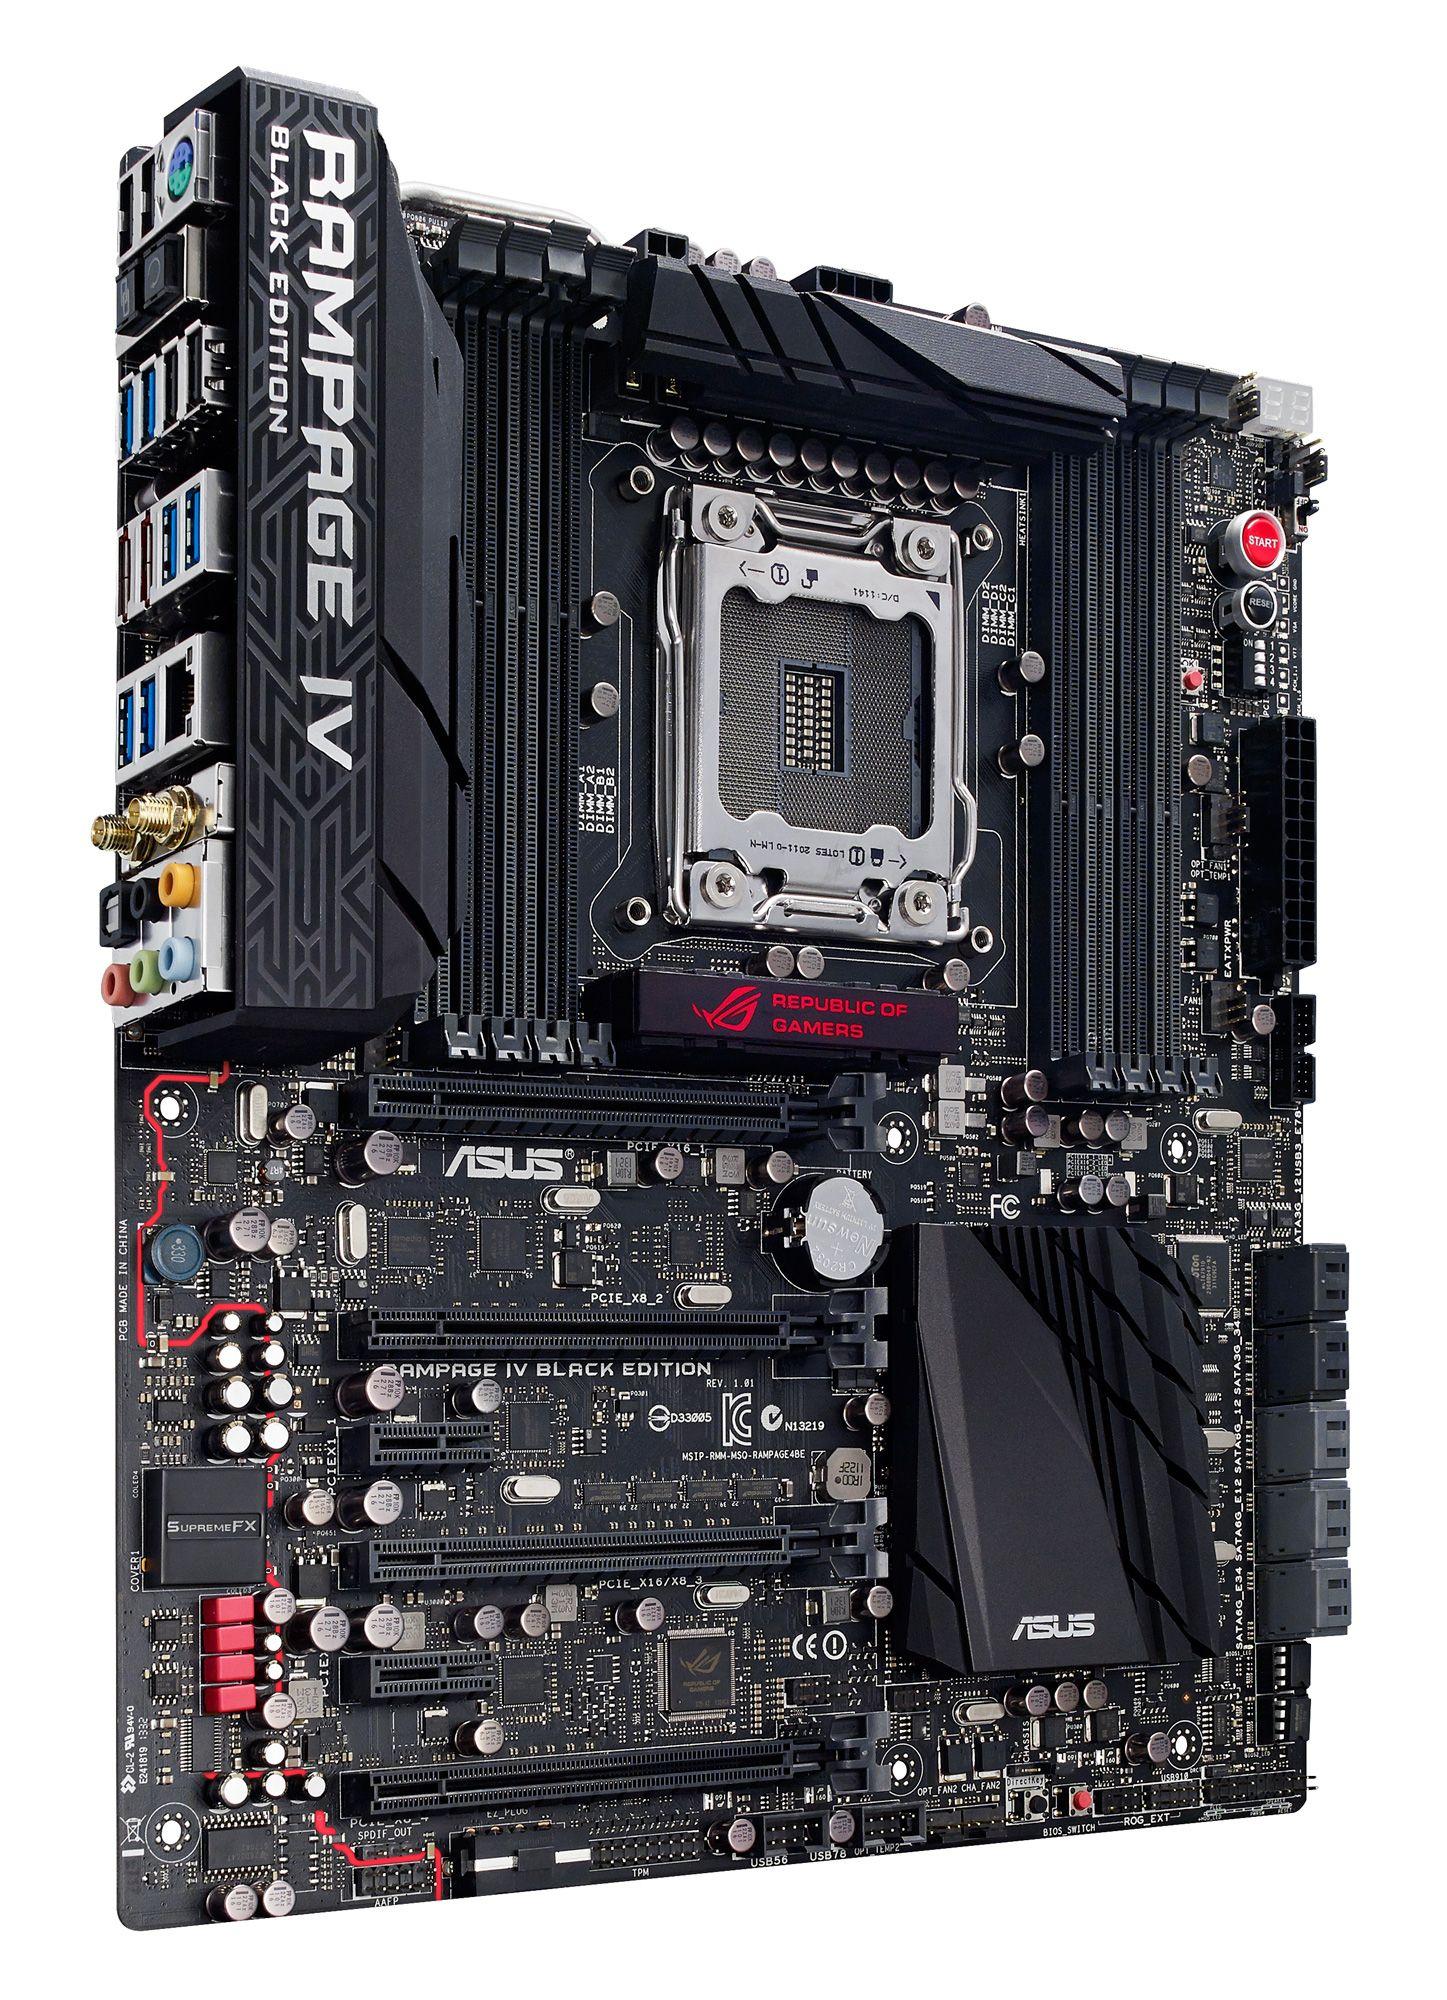 7a69d0565 Asus Rampage IV Black Edition | PC Hardware | Pc gaming setup, Pc ...